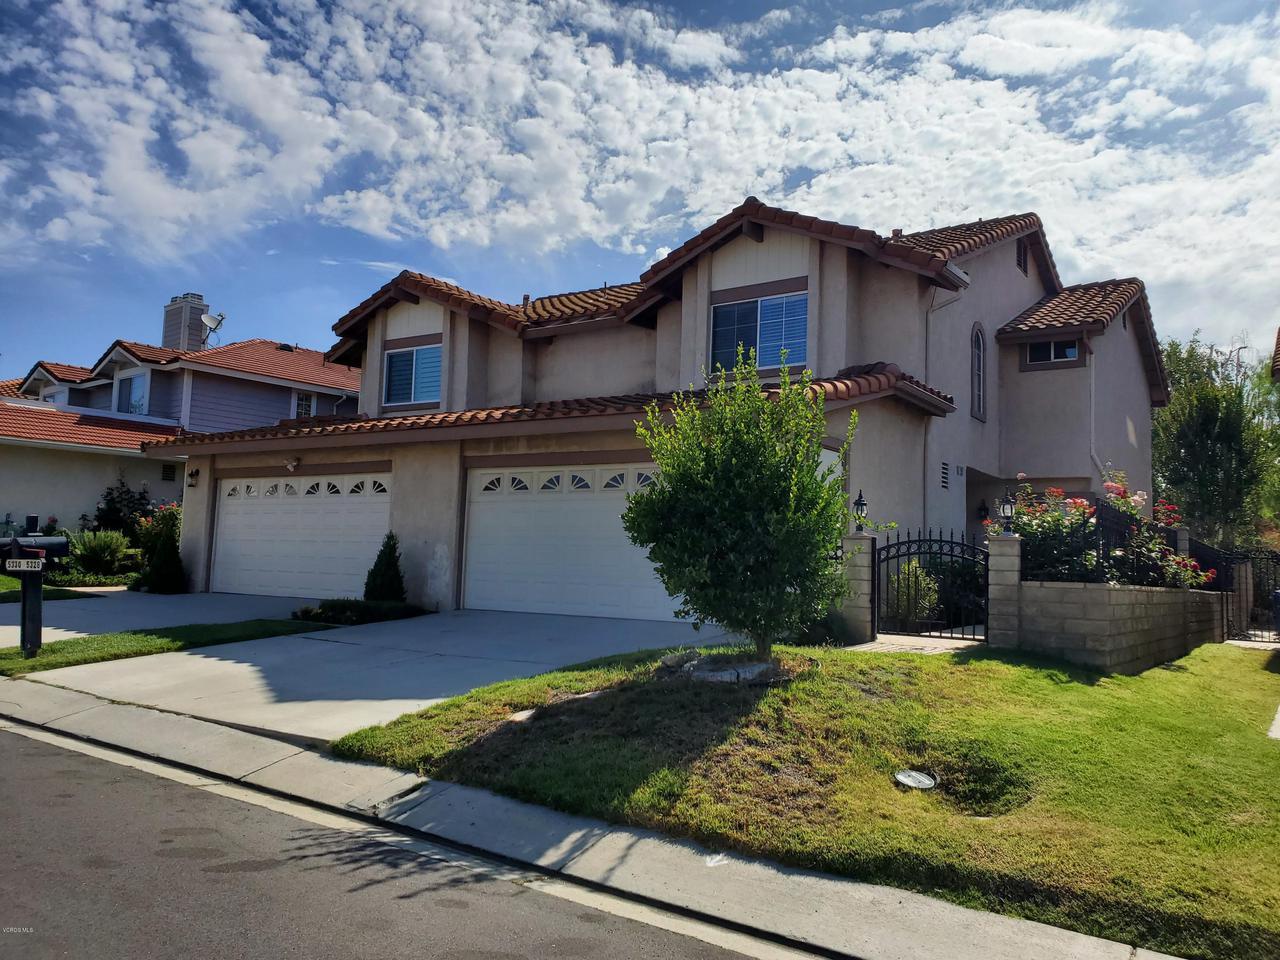 Photo of 5328 FRANCISCA WAY, Agoura Hills, CA 91301